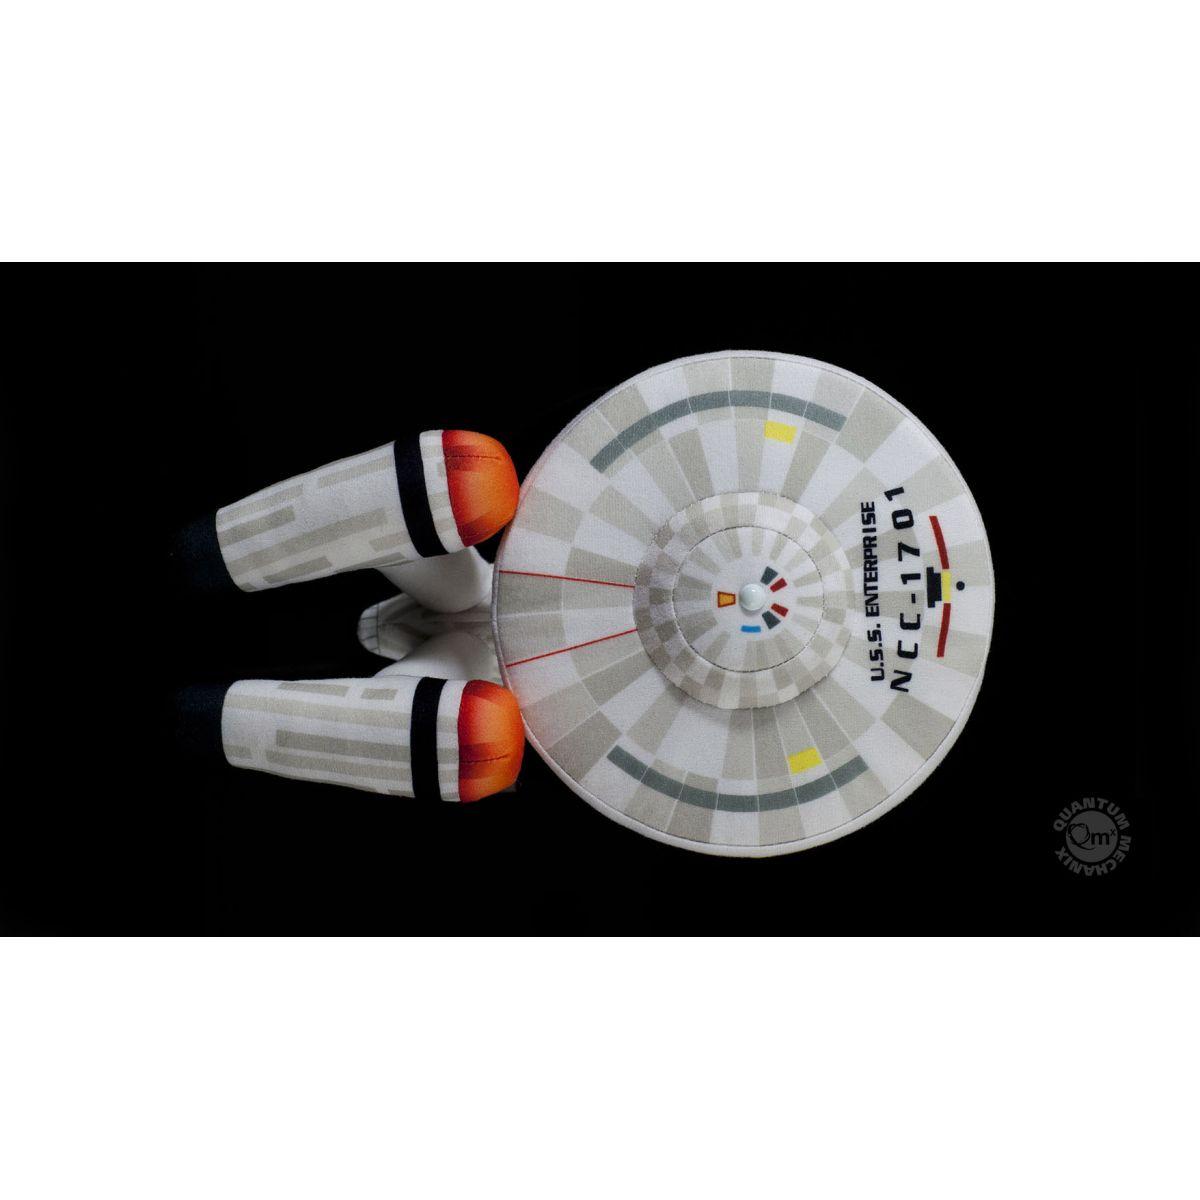 Pelúcia Star Trek U.S.S. Enterprise NCC 1701 - Quantum Mechanix